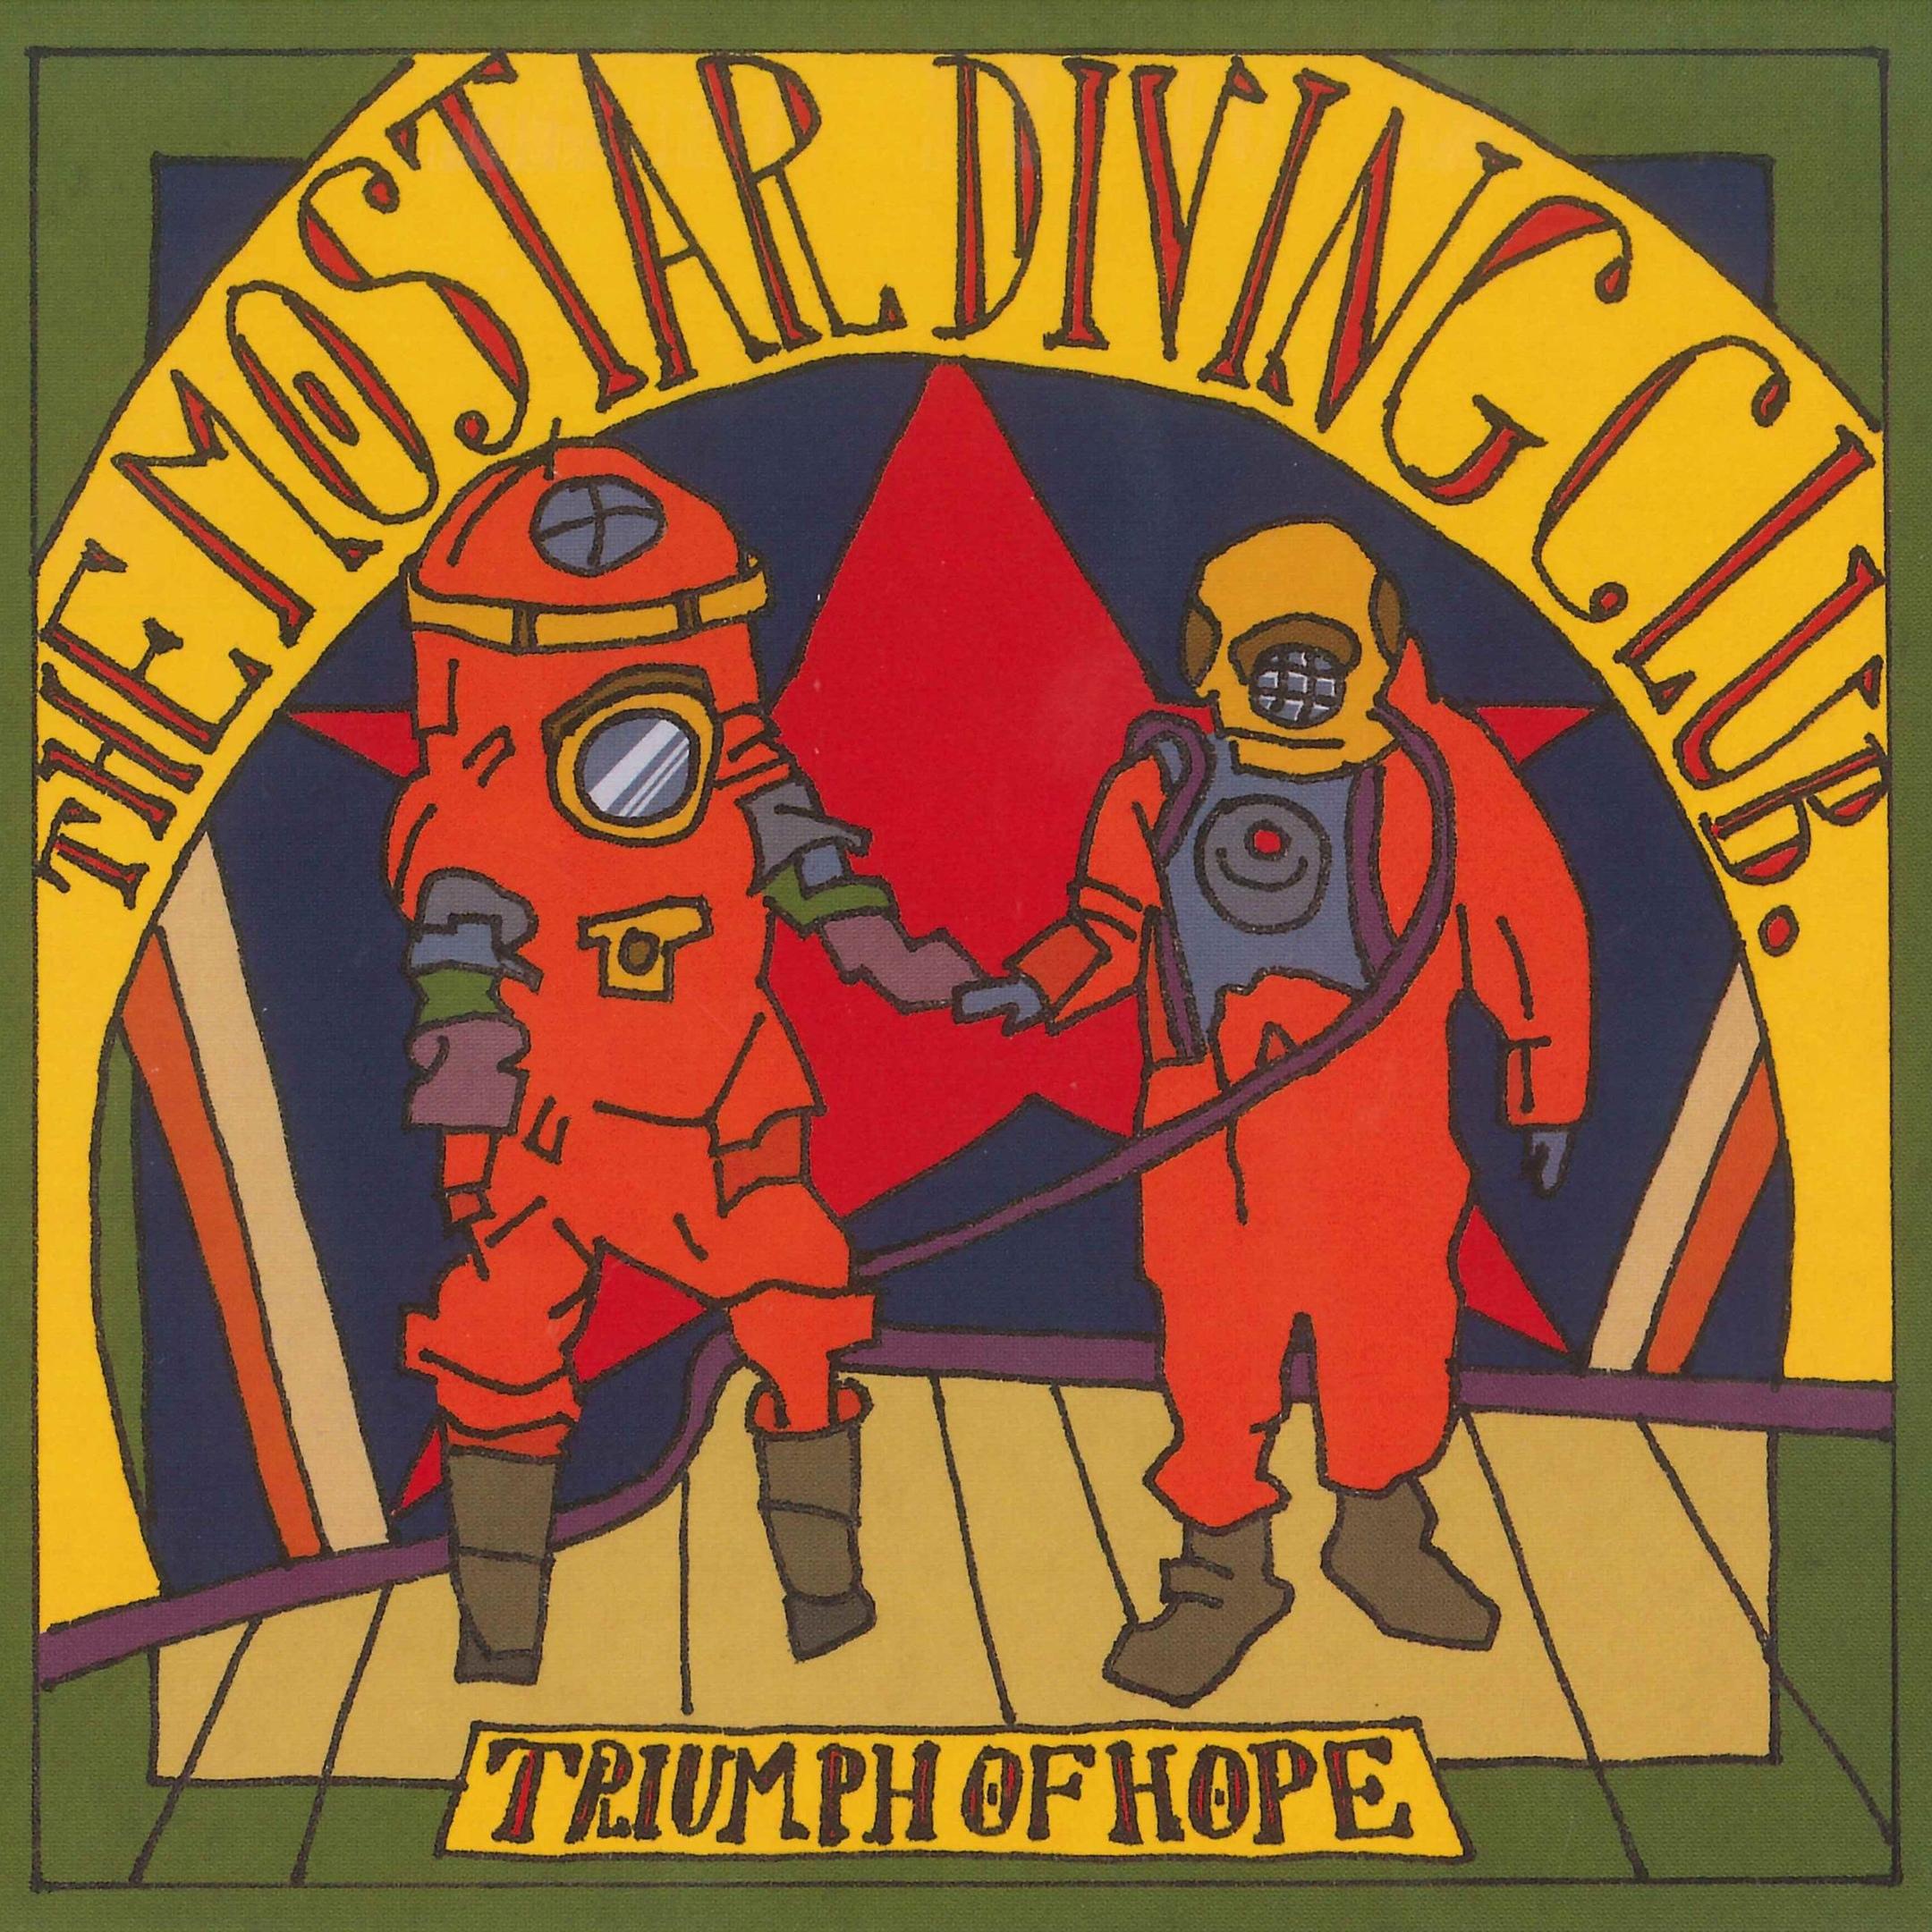 The Mostar Diving Club